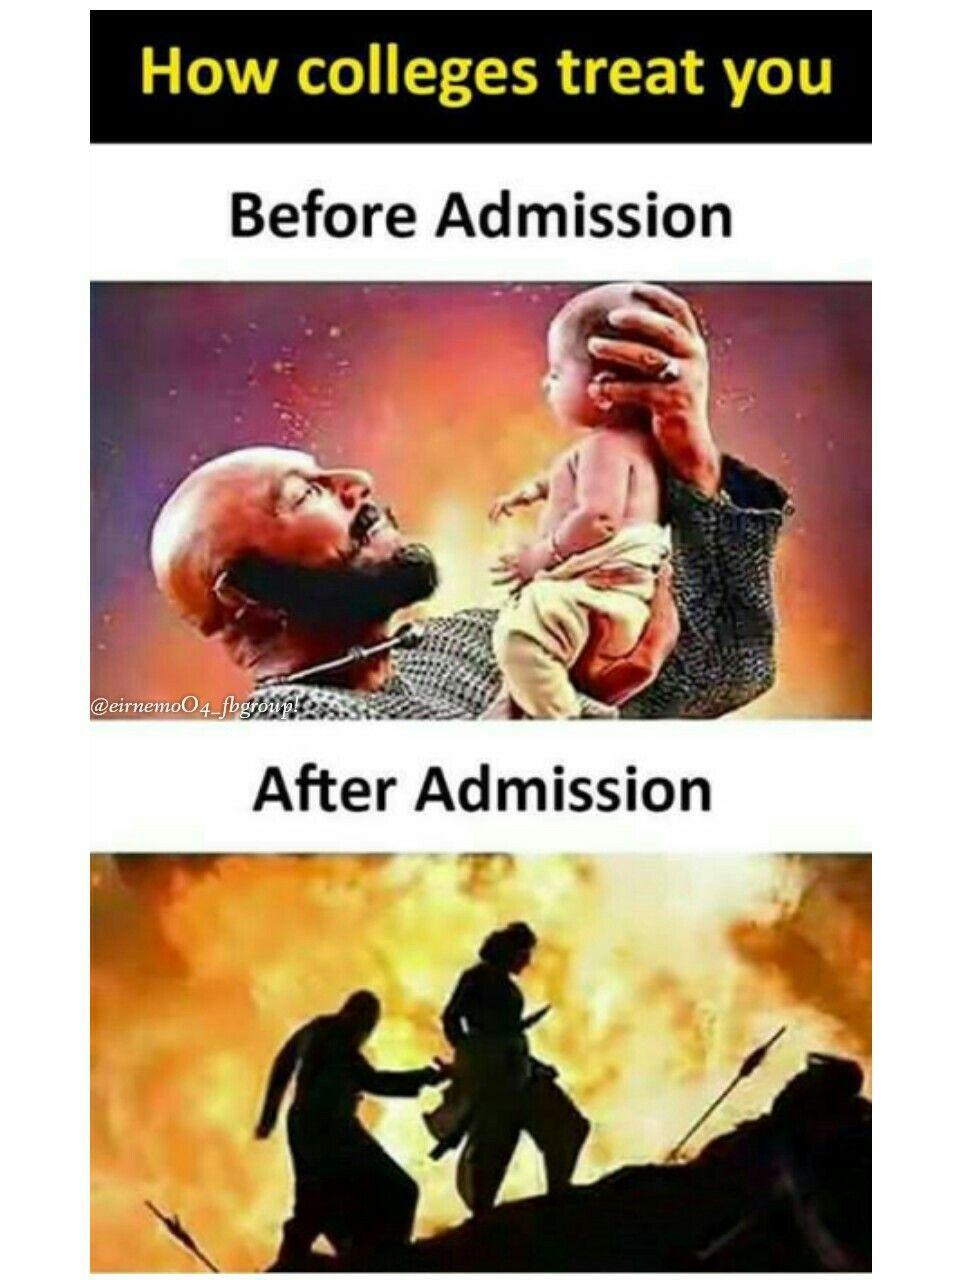 So True Funny Jokes Memes Comedy College School Exams Sarcastic Funny English Jokes Funny School Memes Exam Quotes Funny